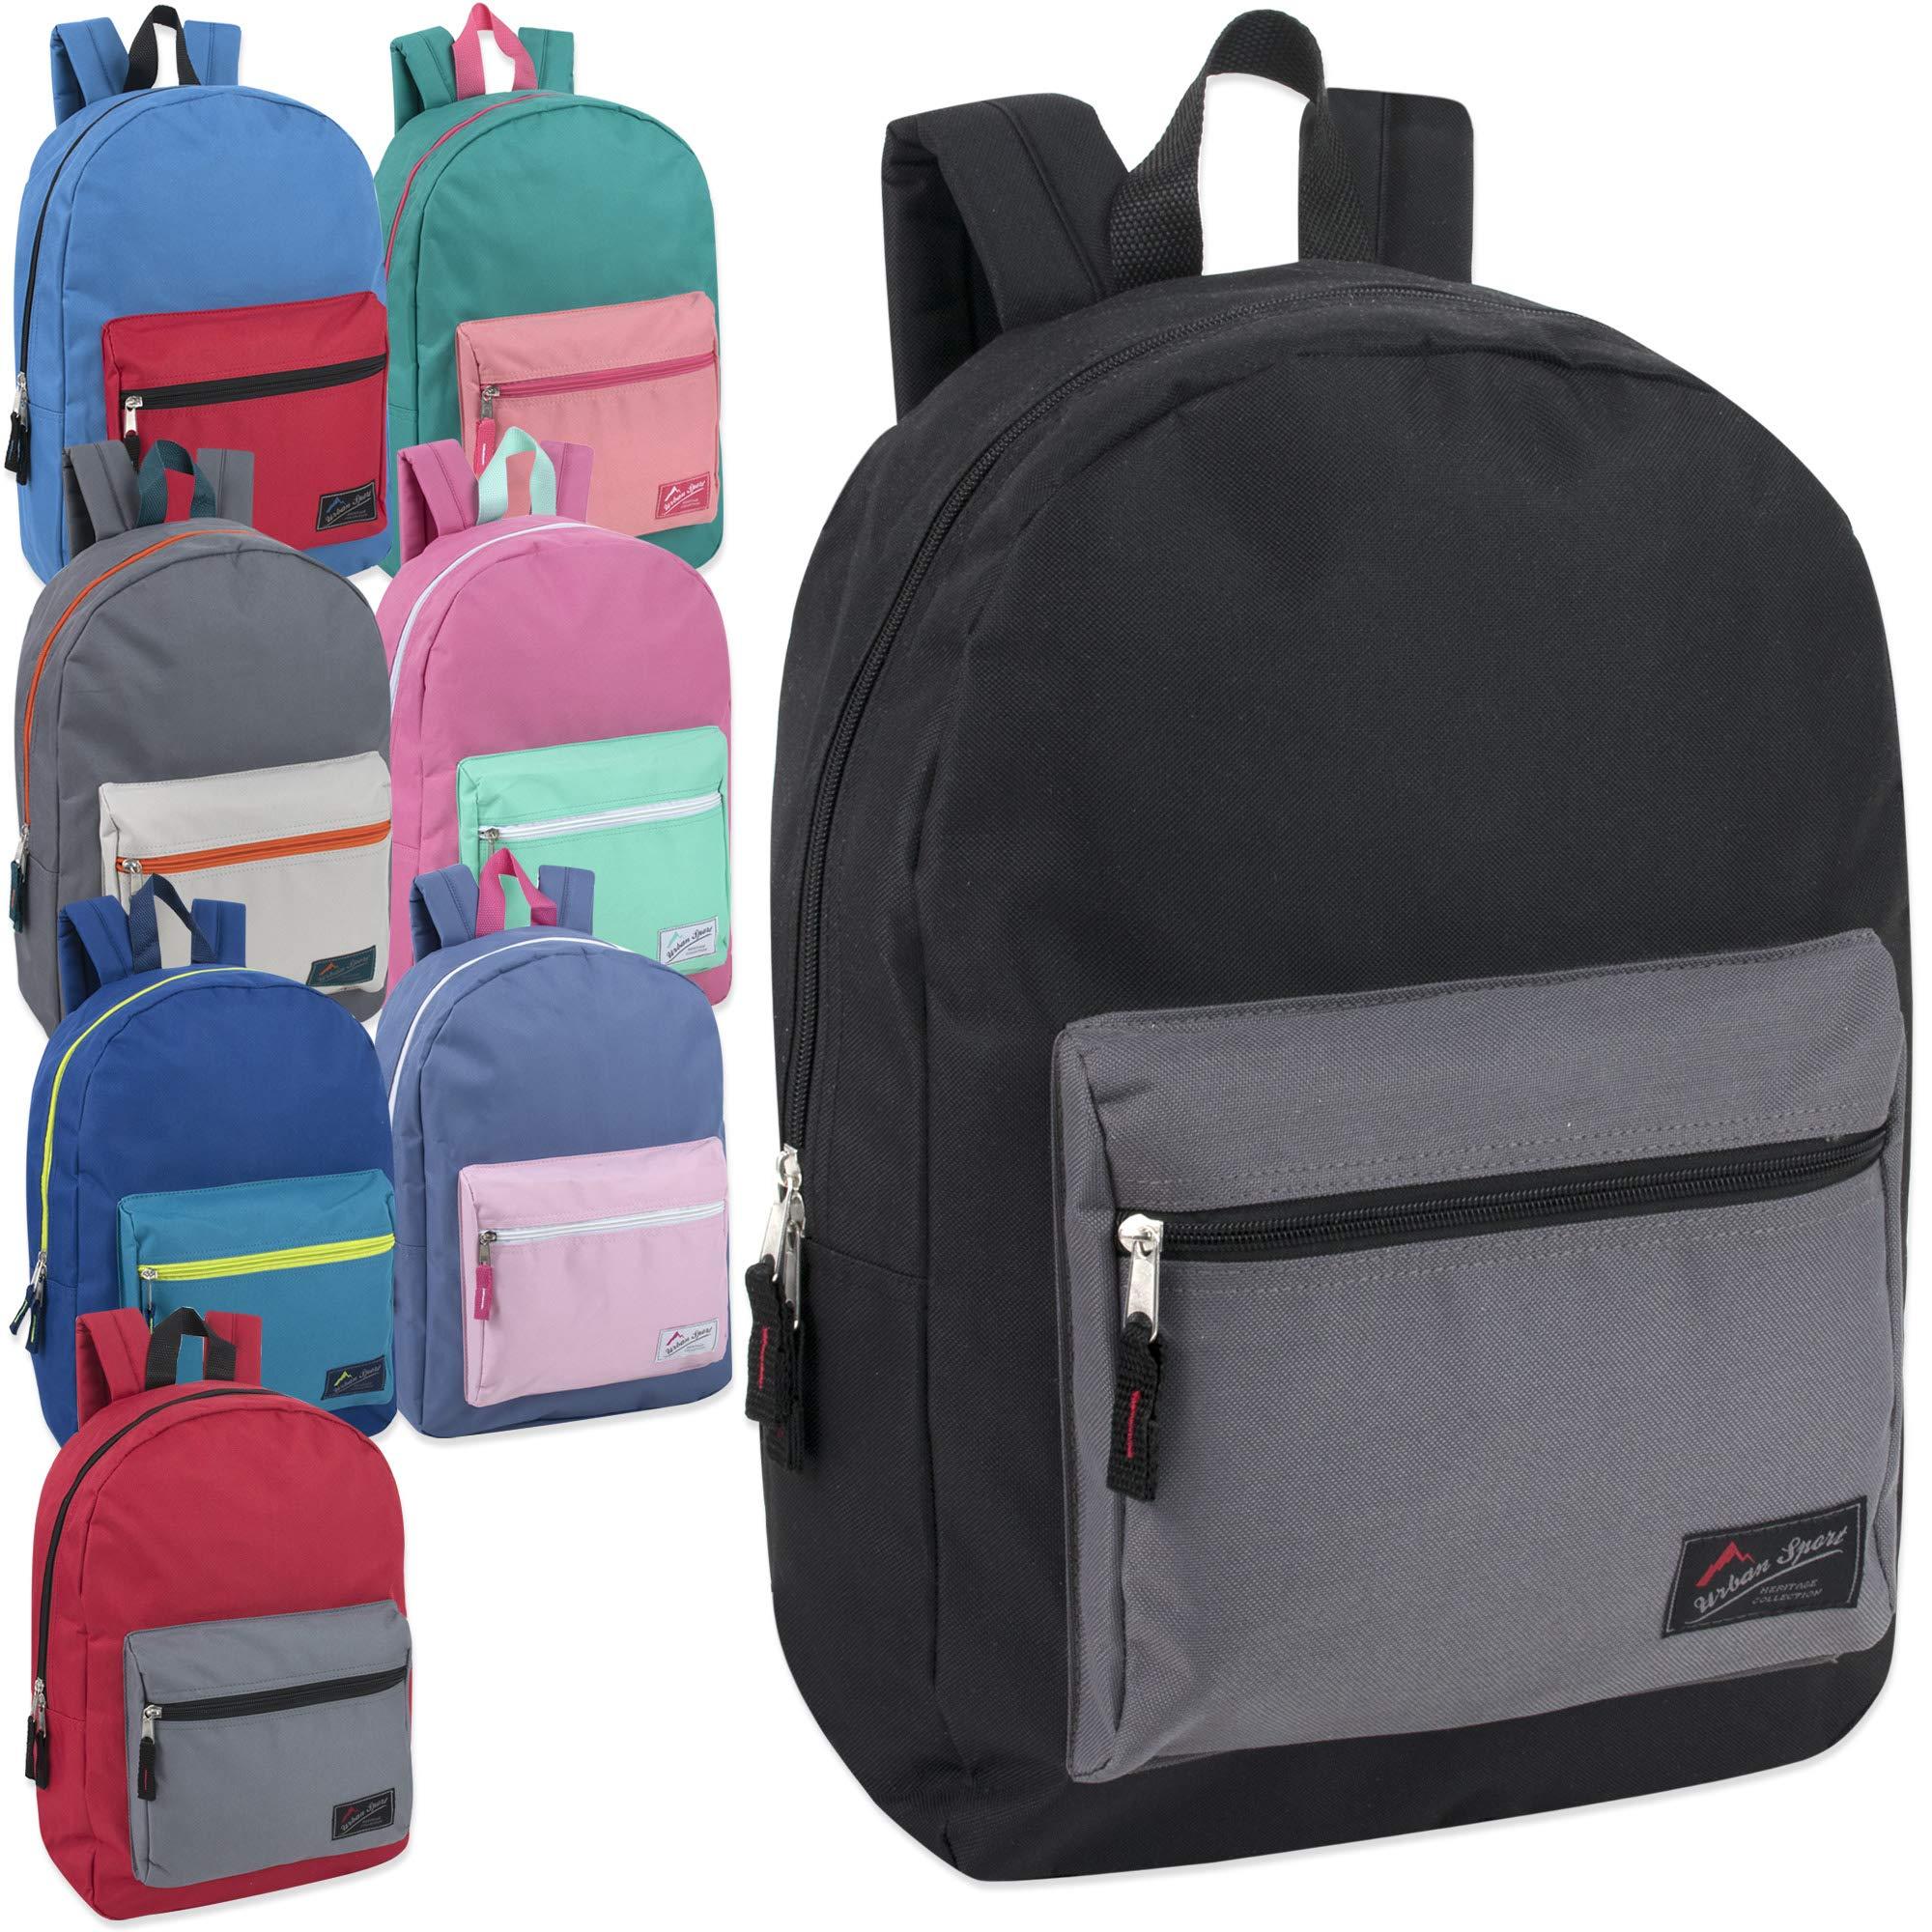 Wholesale Urban Sport 17 Inch MultiColor Block Backpacks in Bulk 24 Value Packs by Urban Sport